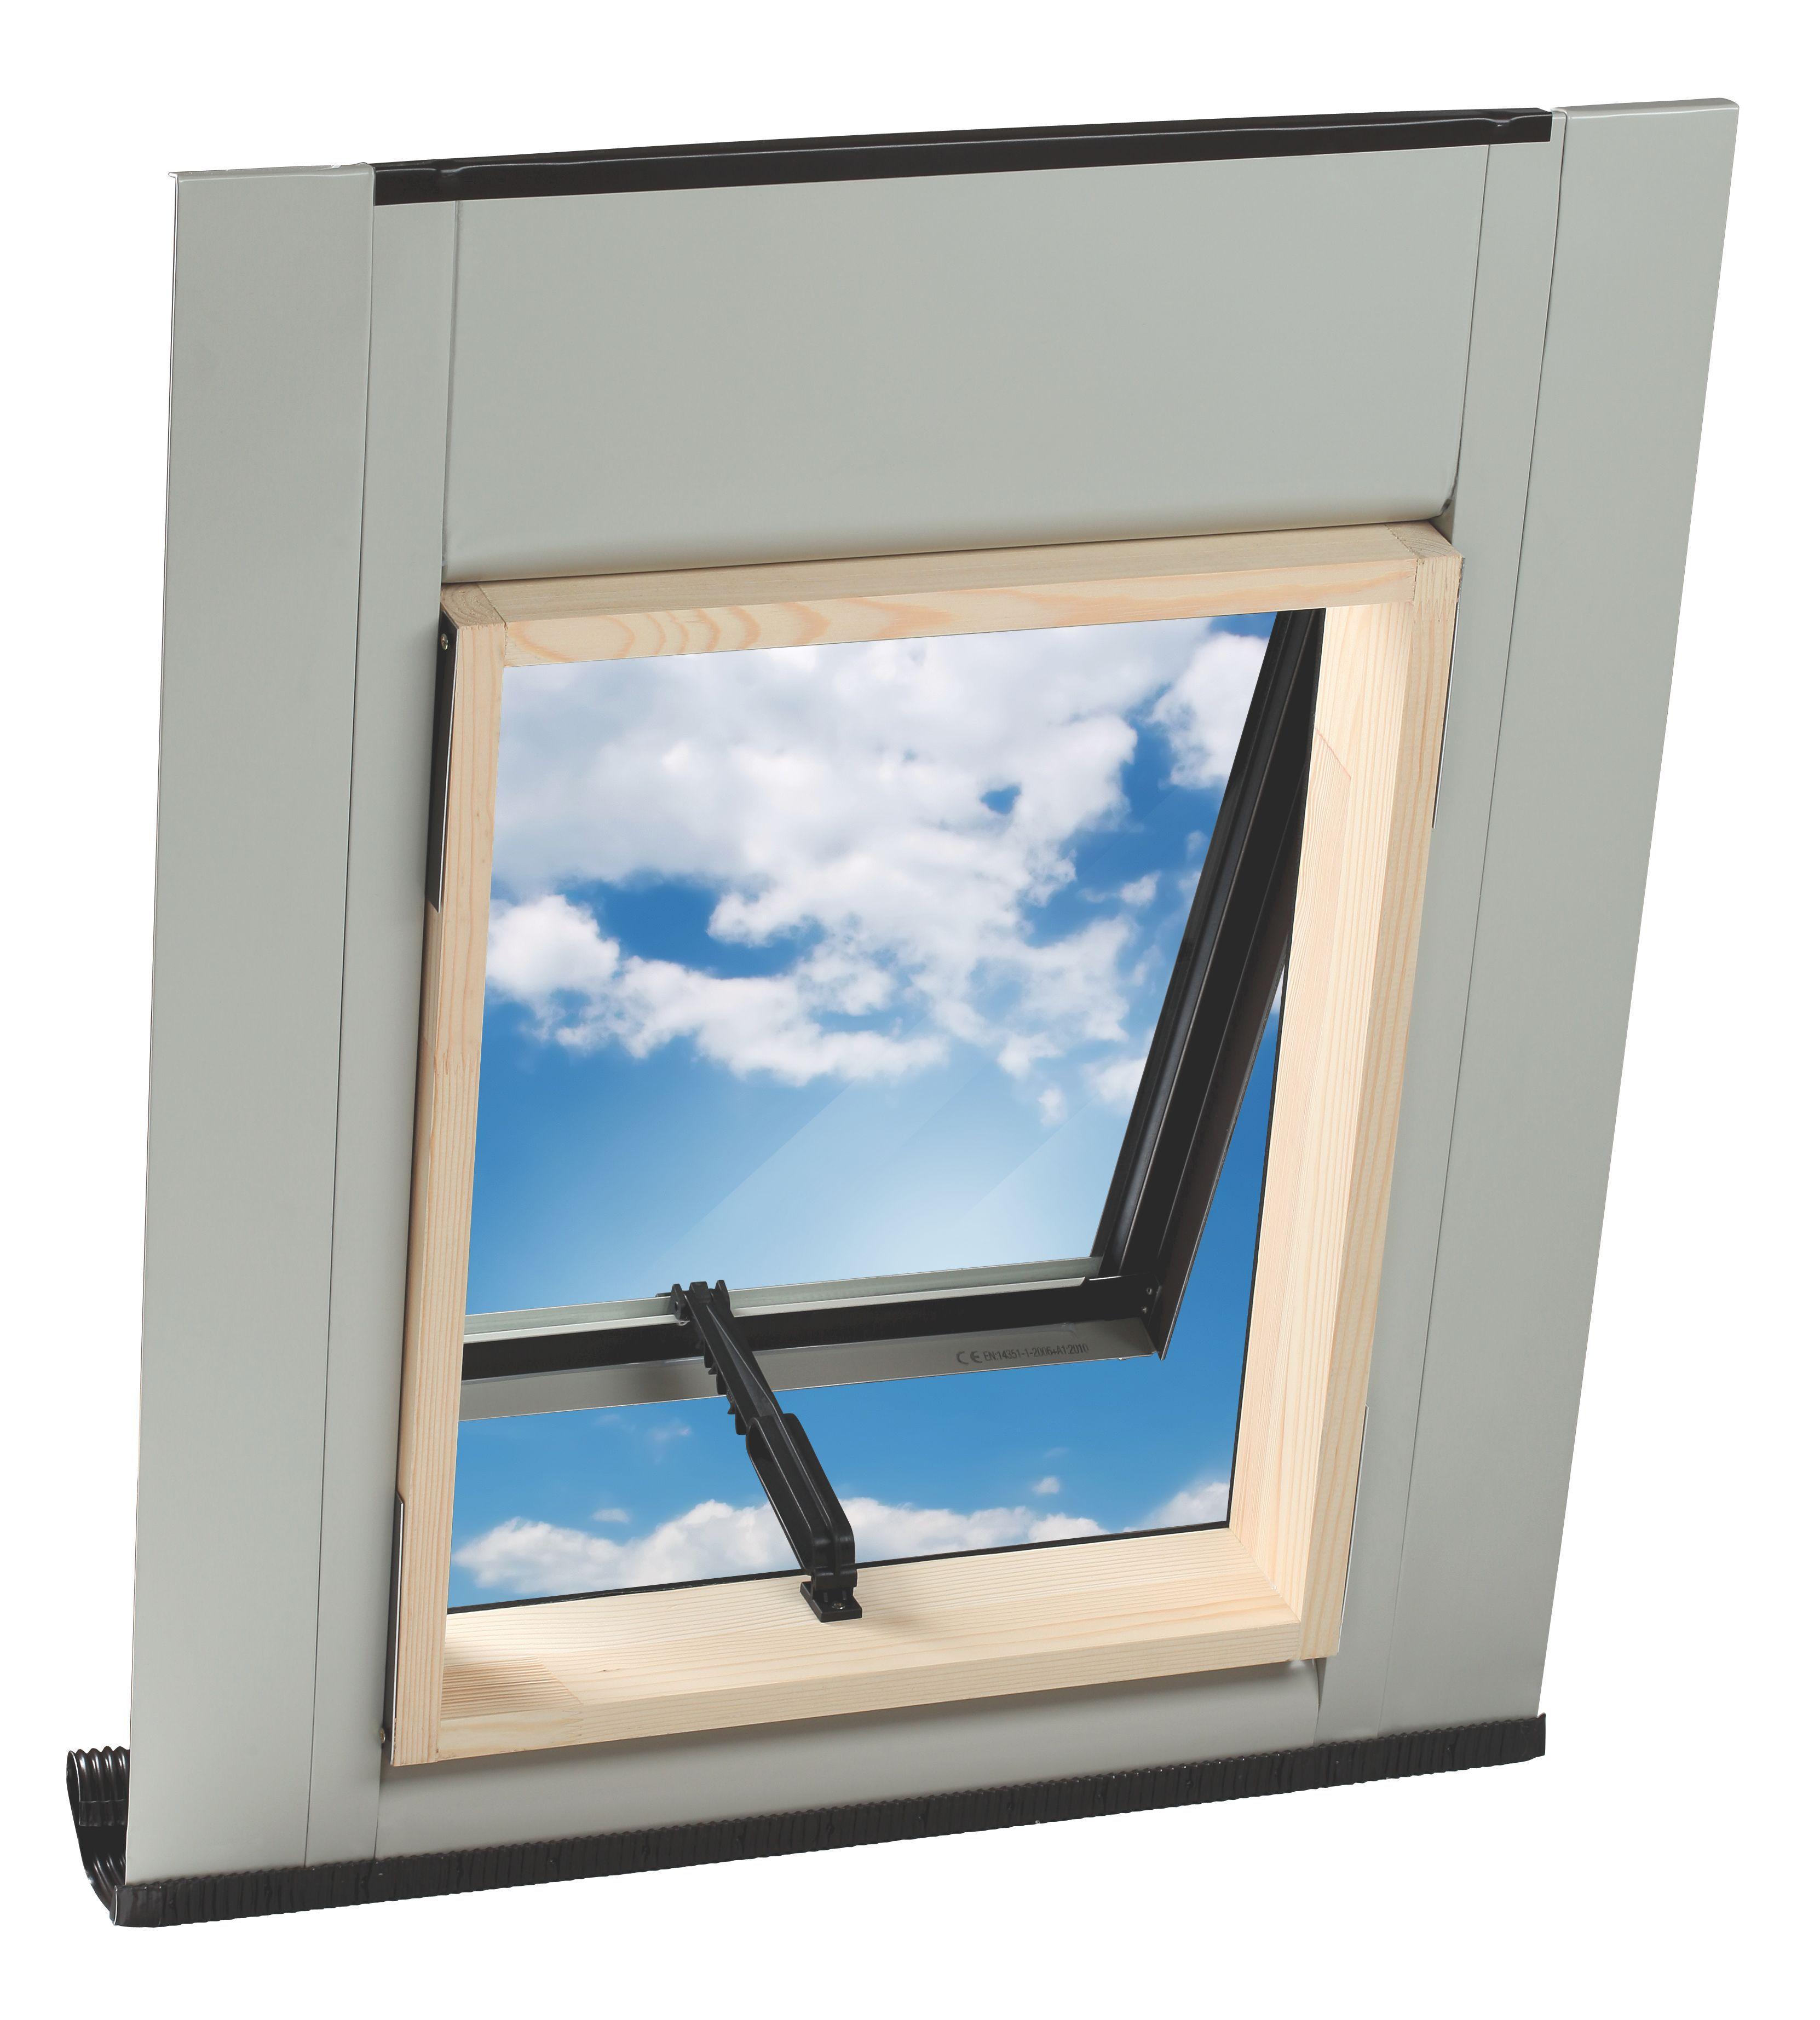 Geom Aero Pine Top Hung Roof Window H 550mm W 450mm